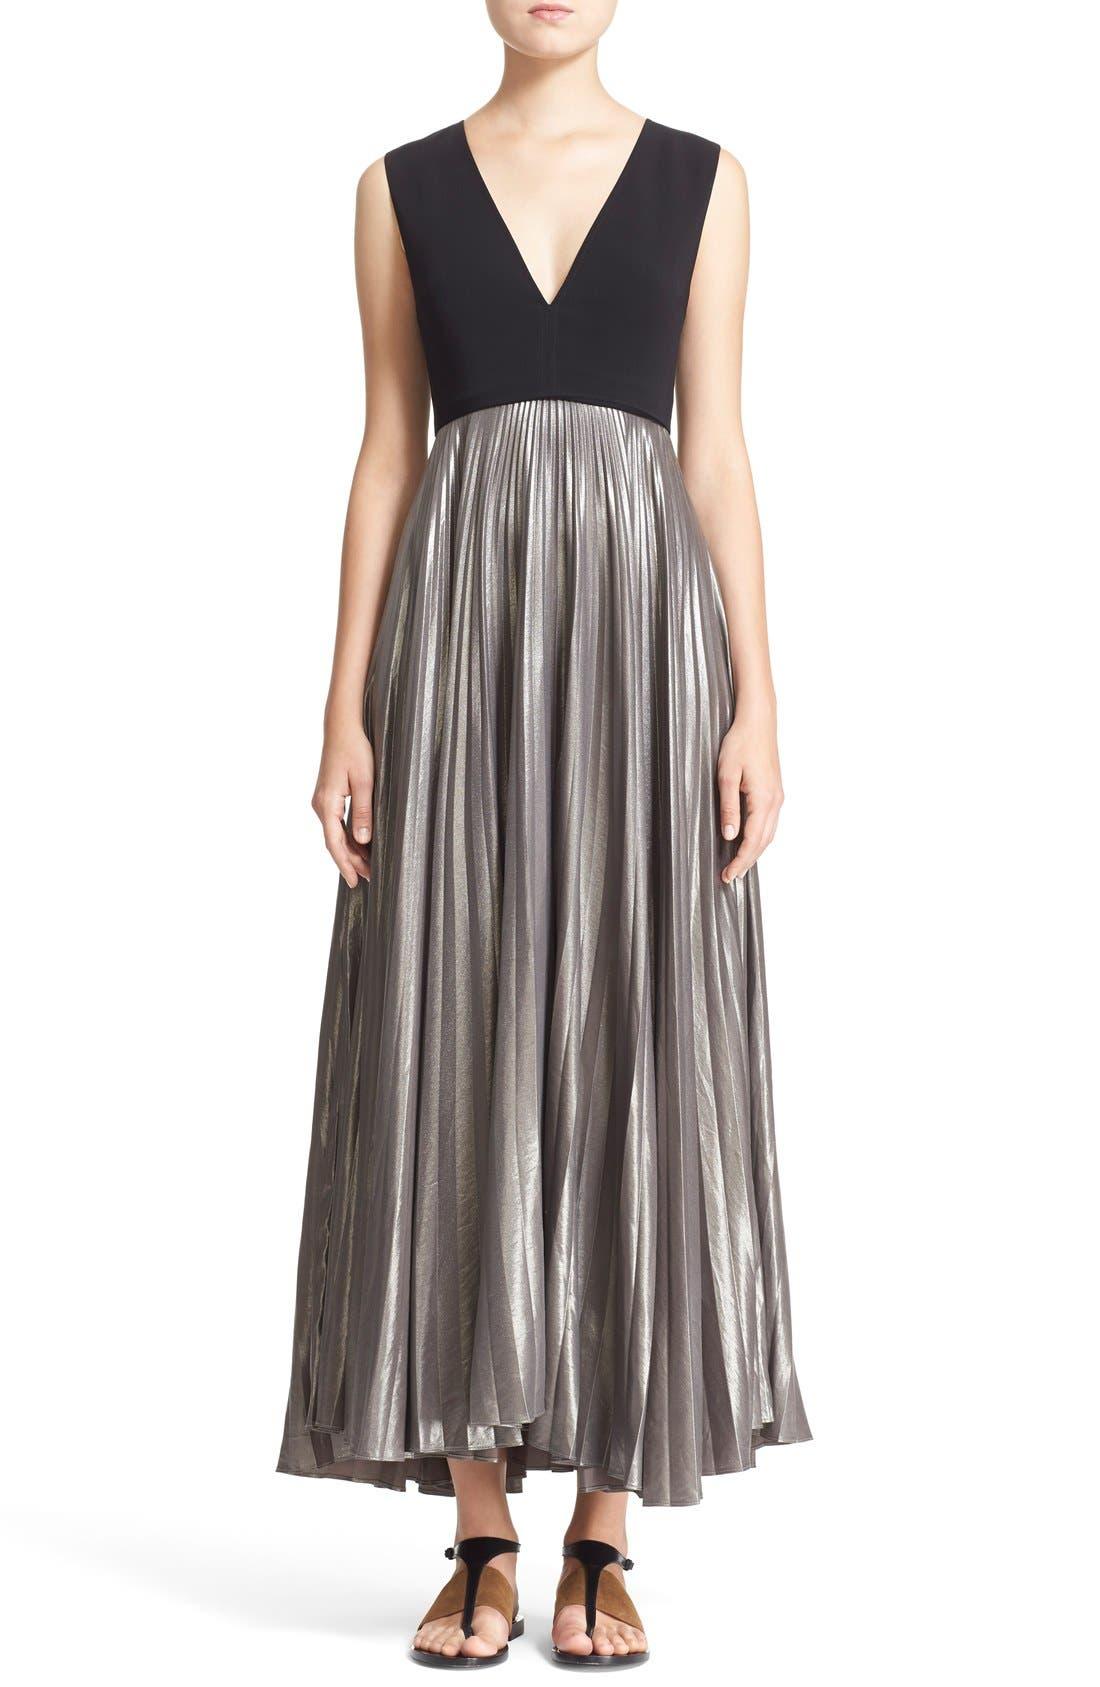 Alternate Image 1 Selected - A.L.C. 'Emilia' Pleated Midi Dress